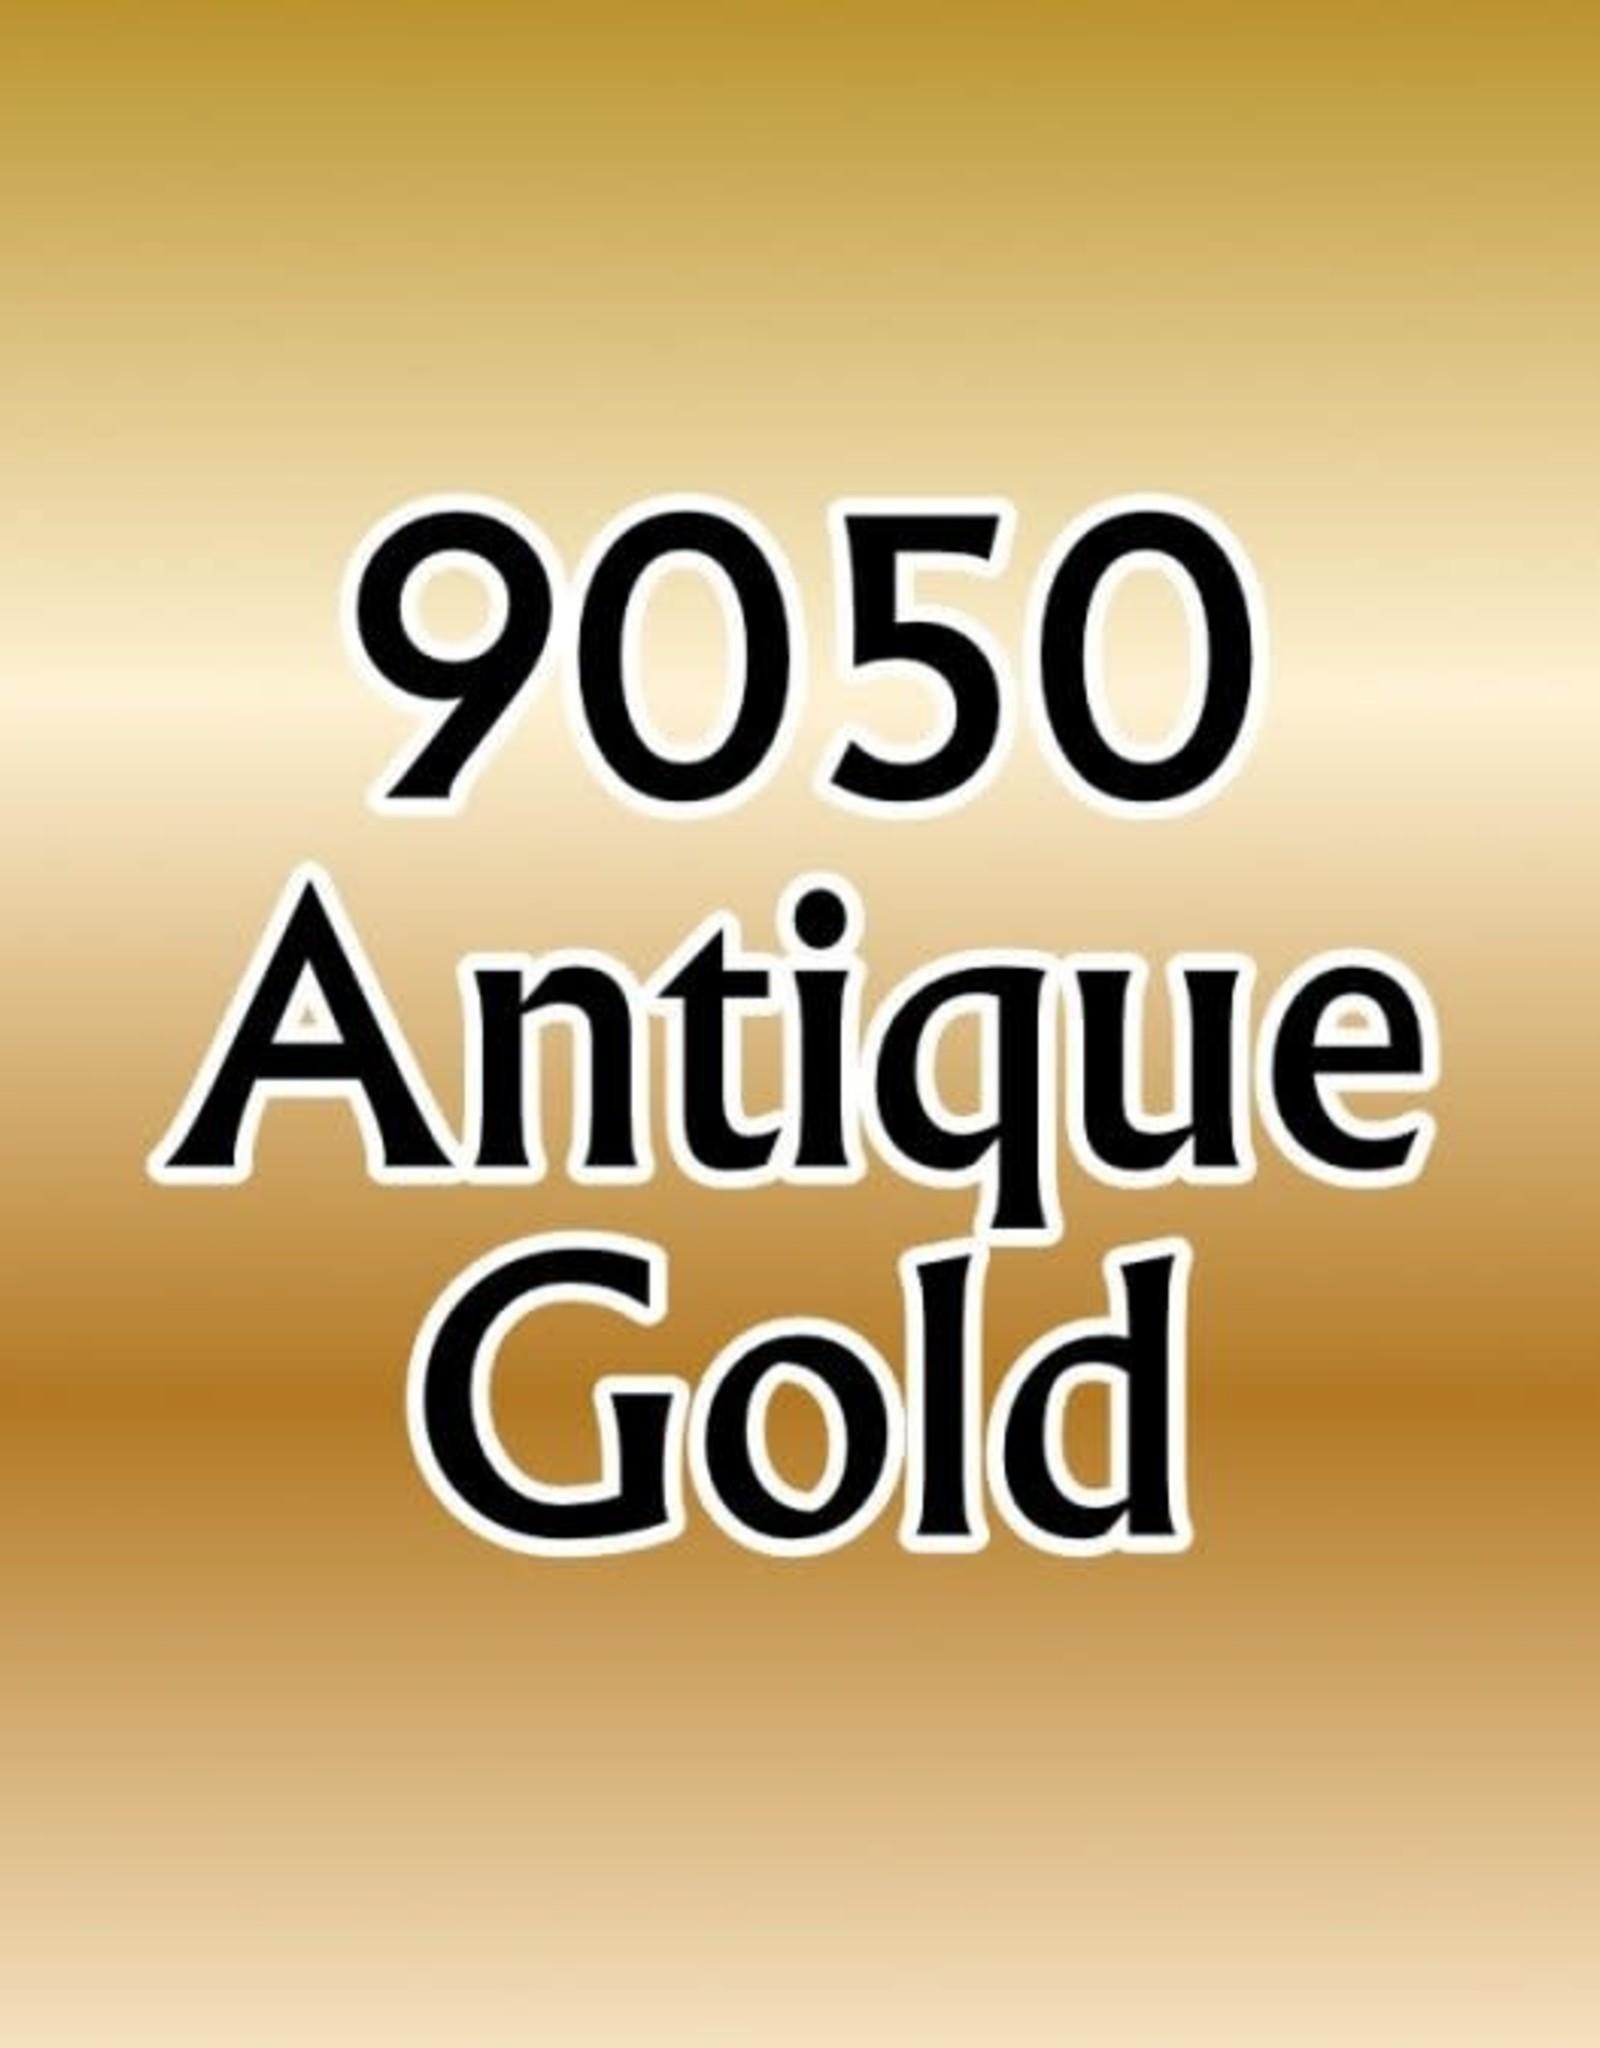 Reaper Antique Gold